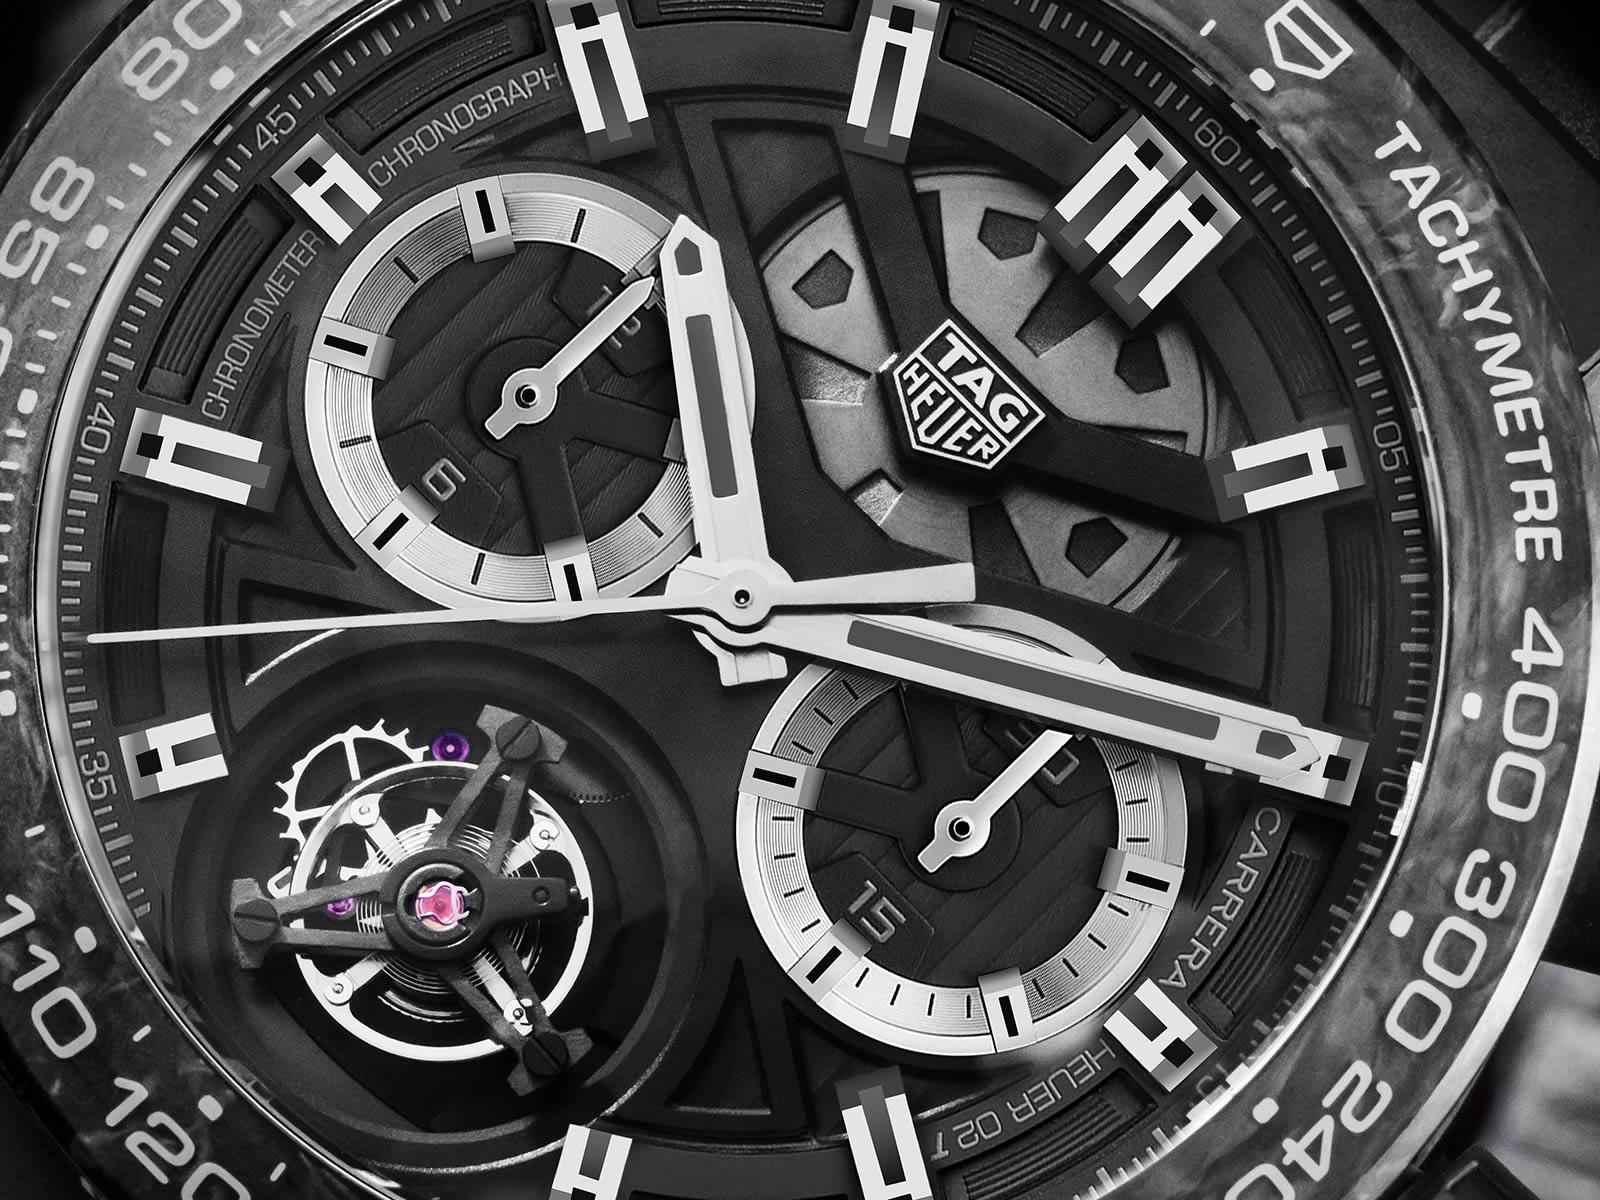 car5a8p-fc6415-tag-heuer-carrera-calibre-heuer02t-automatic-watch-45-mm-3-.jpg